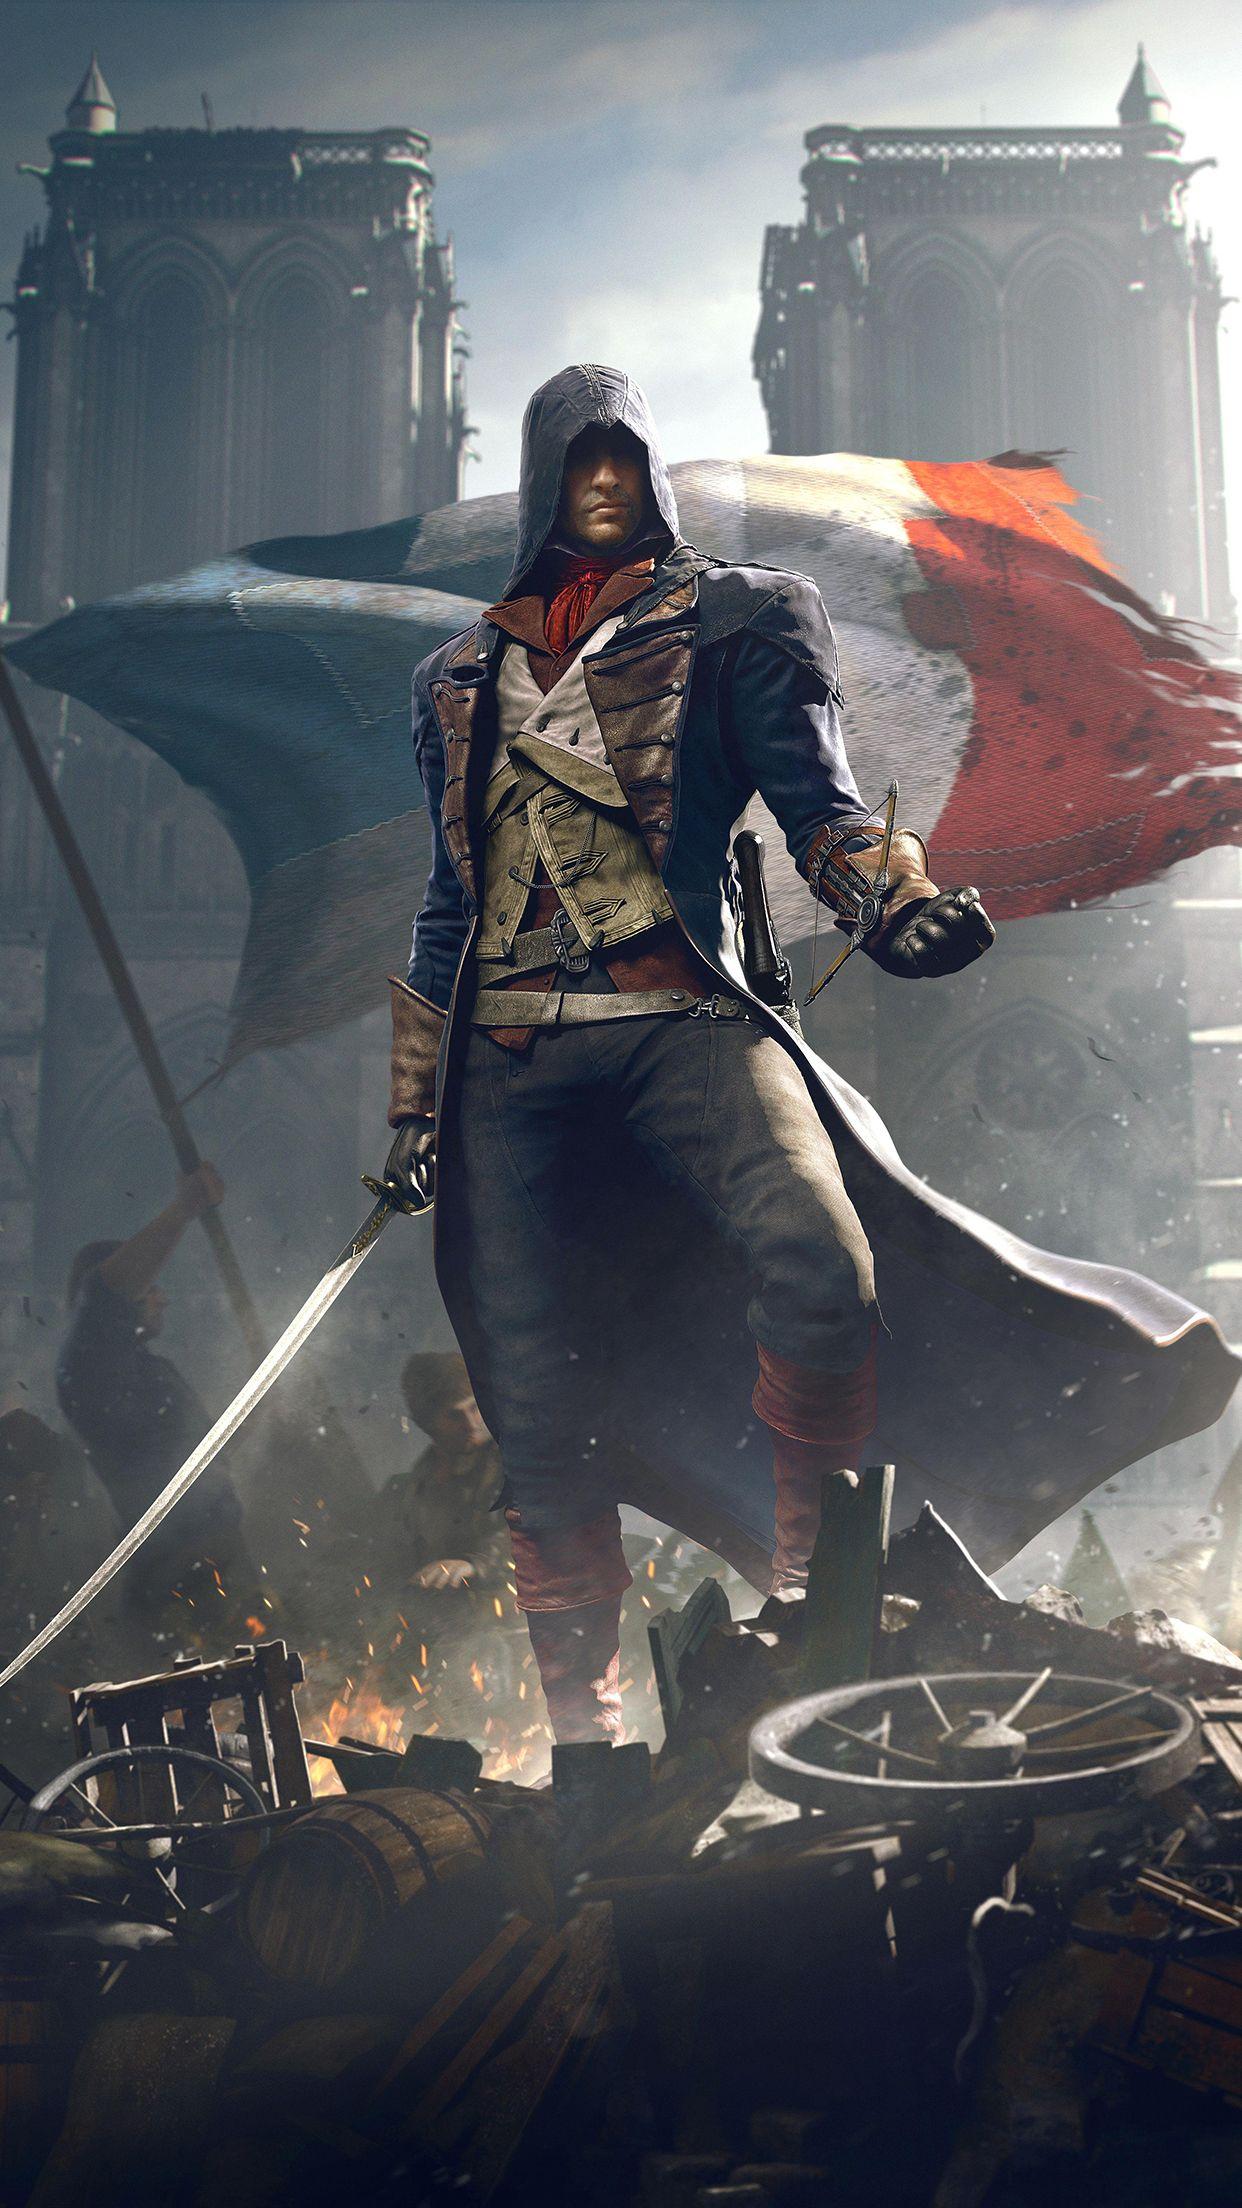 Assassins Creed Phone Wallpaper Wallpapersafari Assassins Creed Unity Arno Assassin S Creed Assassin S Creed Wallpaper